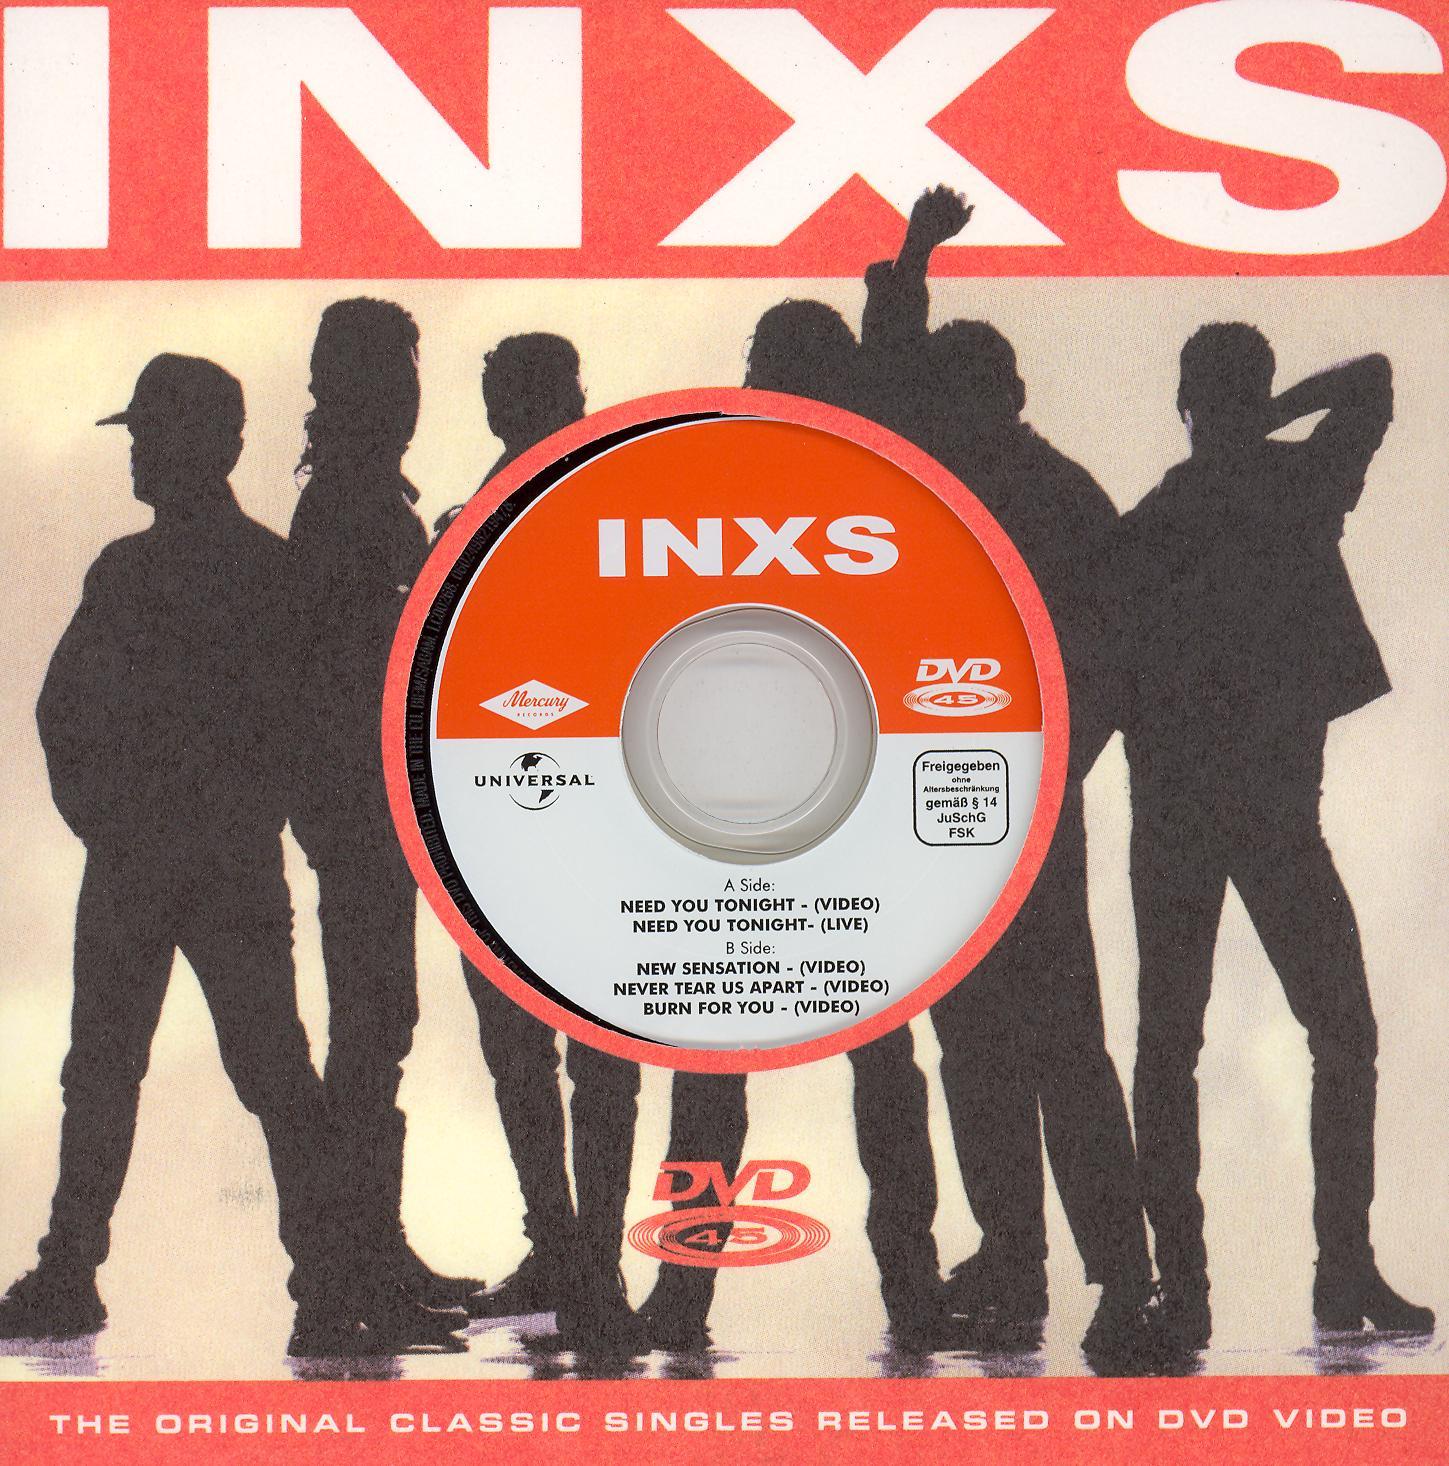 INXS: Need You Tonight